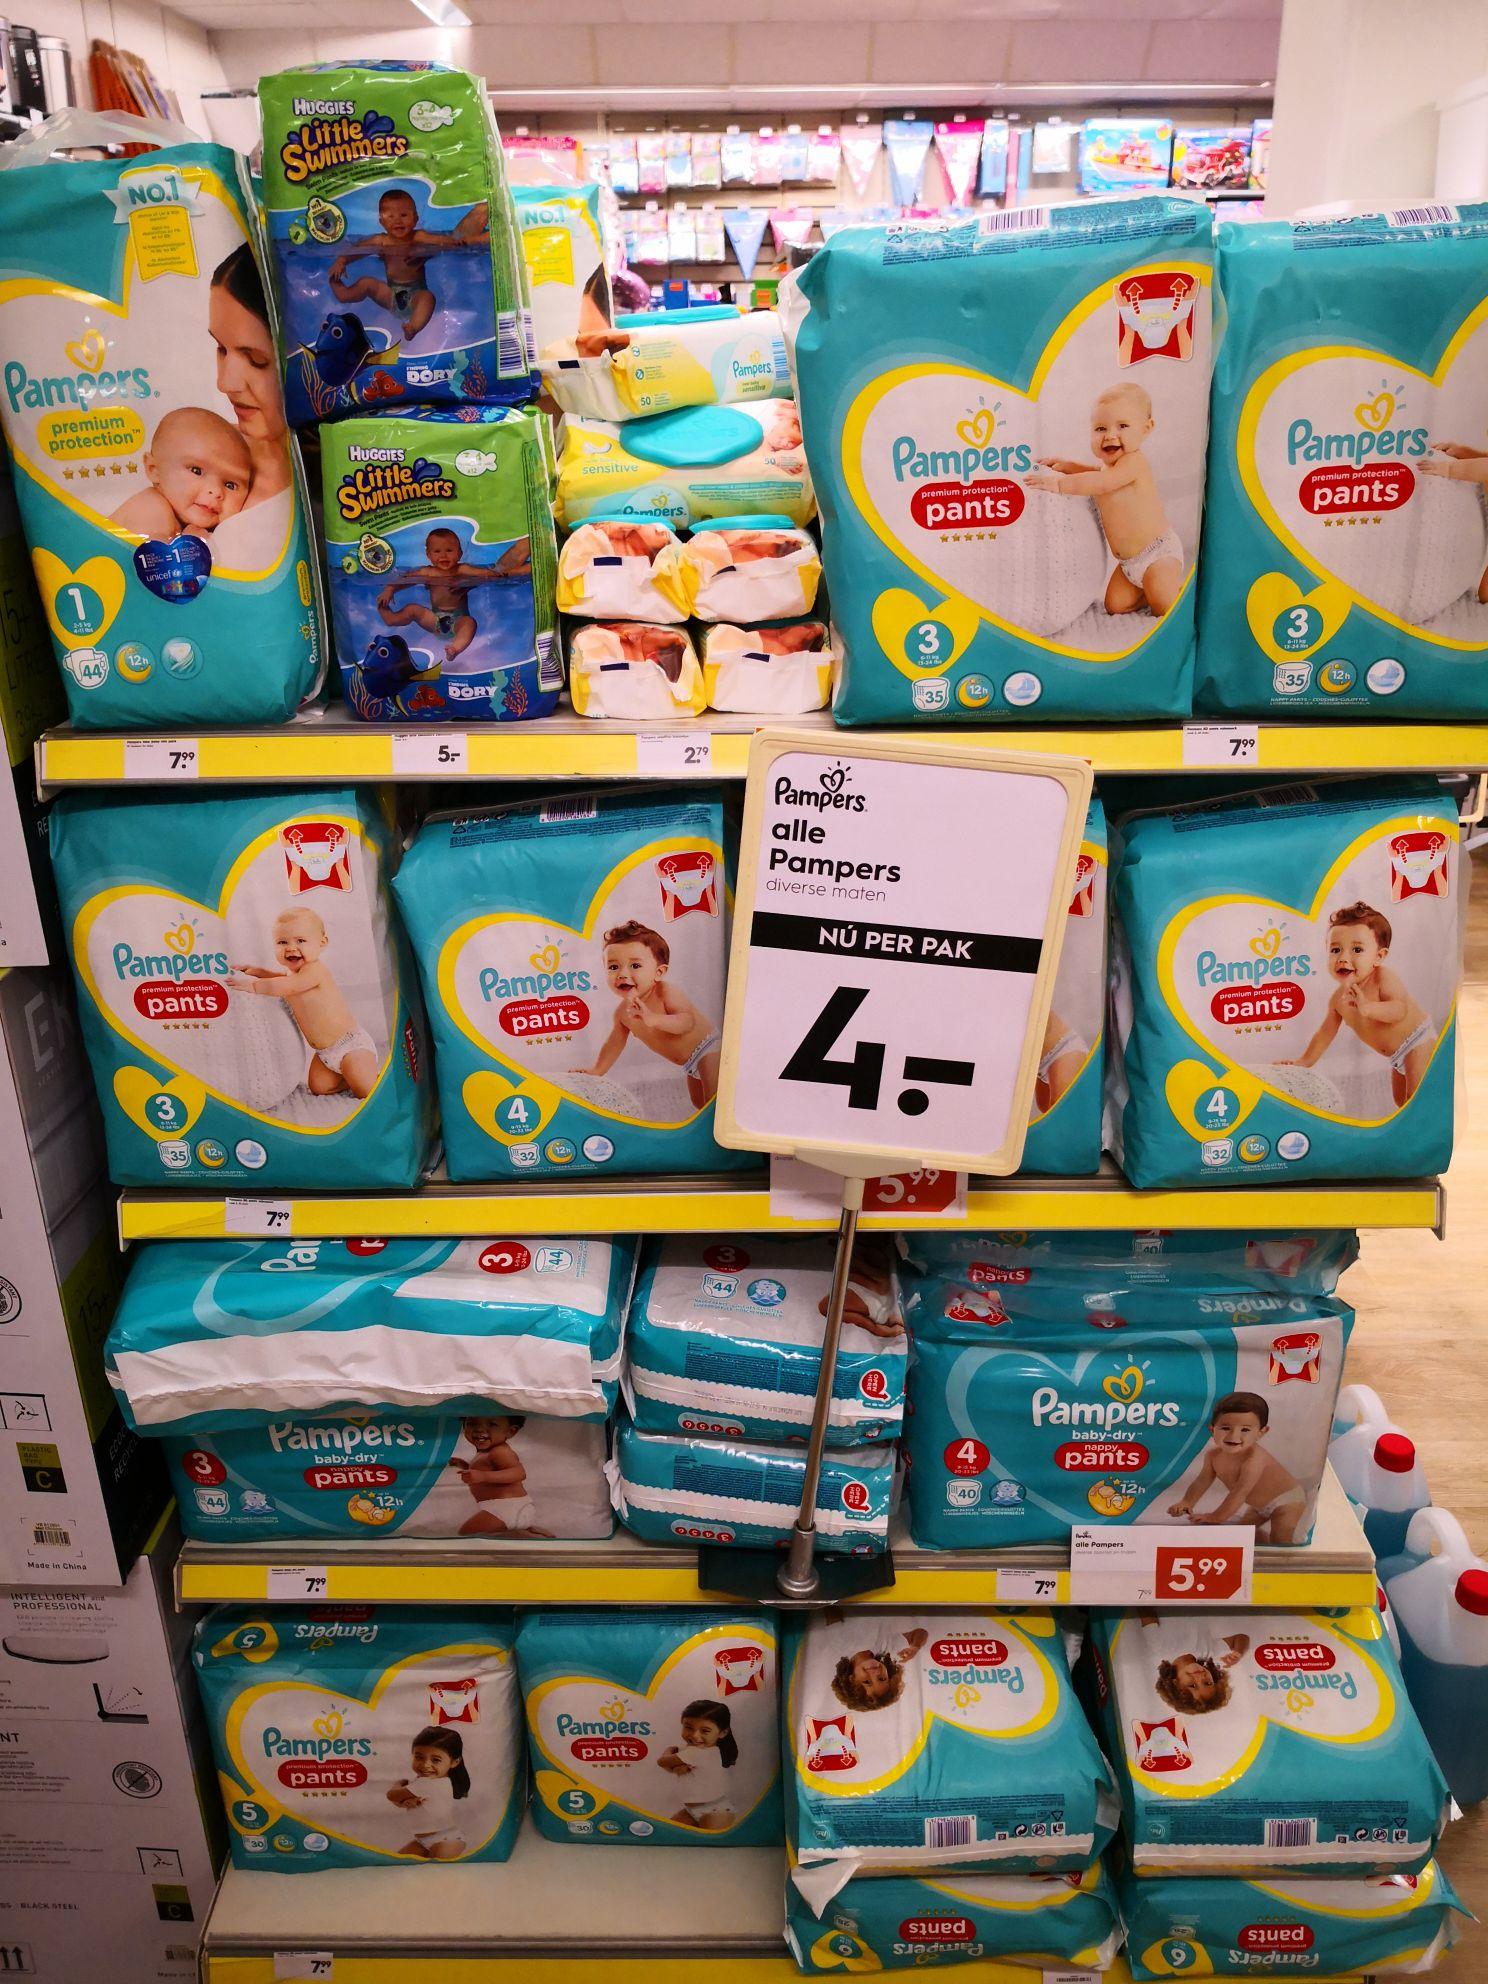 Alle pampers broekjes 4 euro per pak! Normaal 7,99!